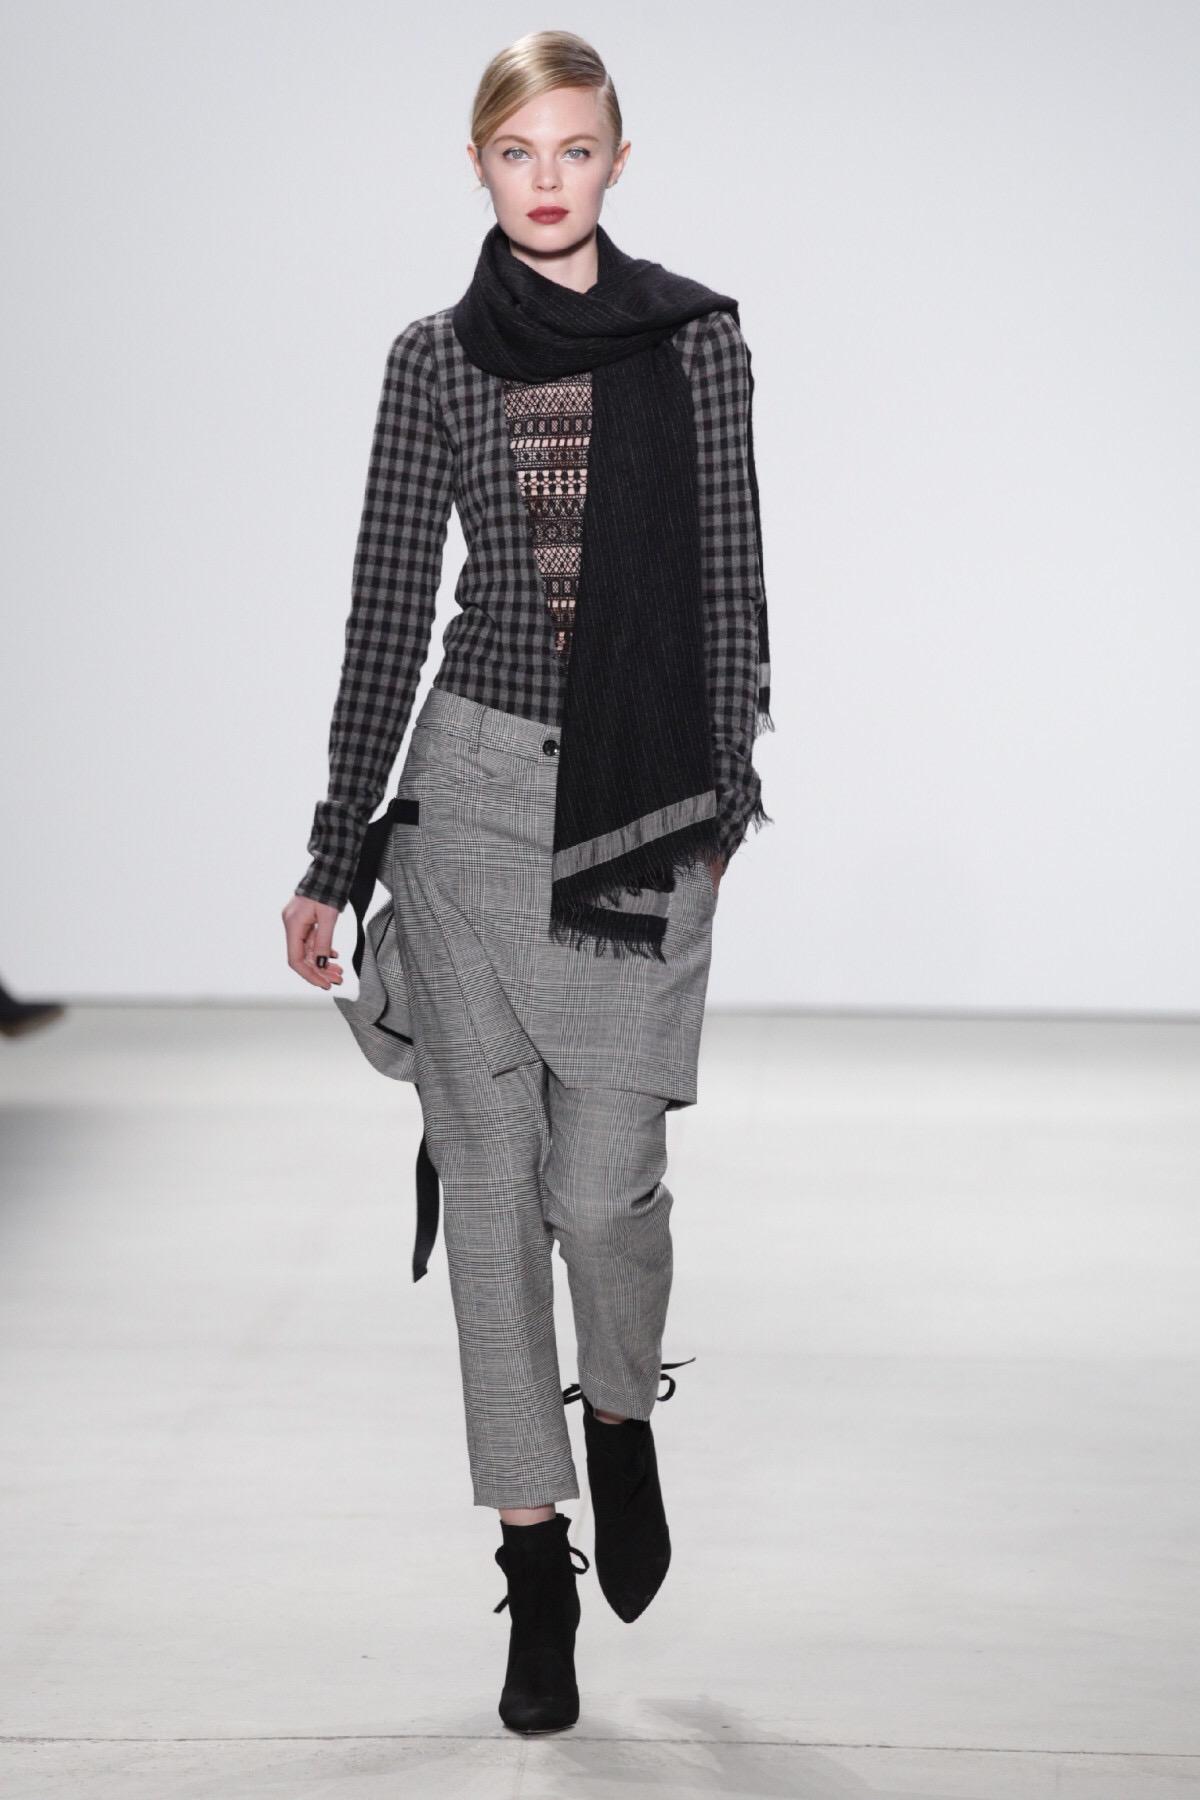 NYFW, Fashion